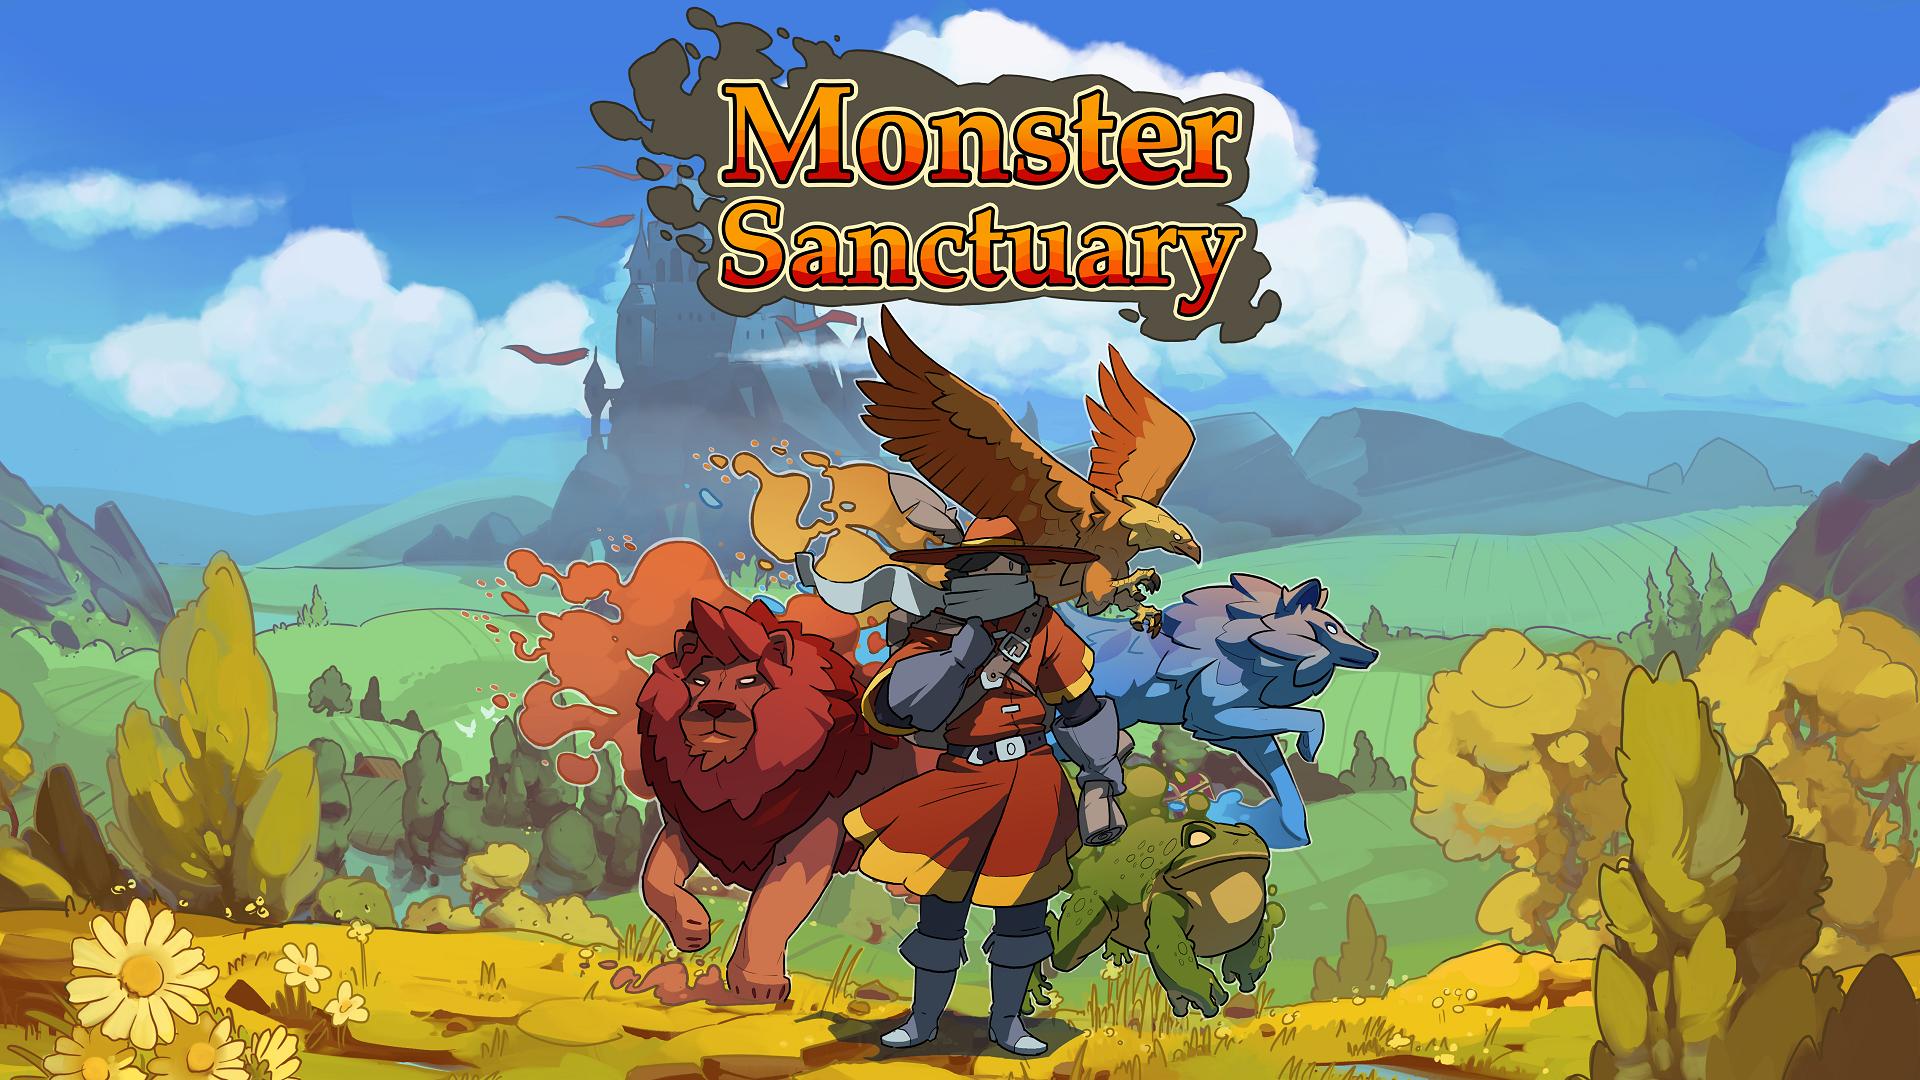 Monster Sanctuary — Moi Rai Games / Team17